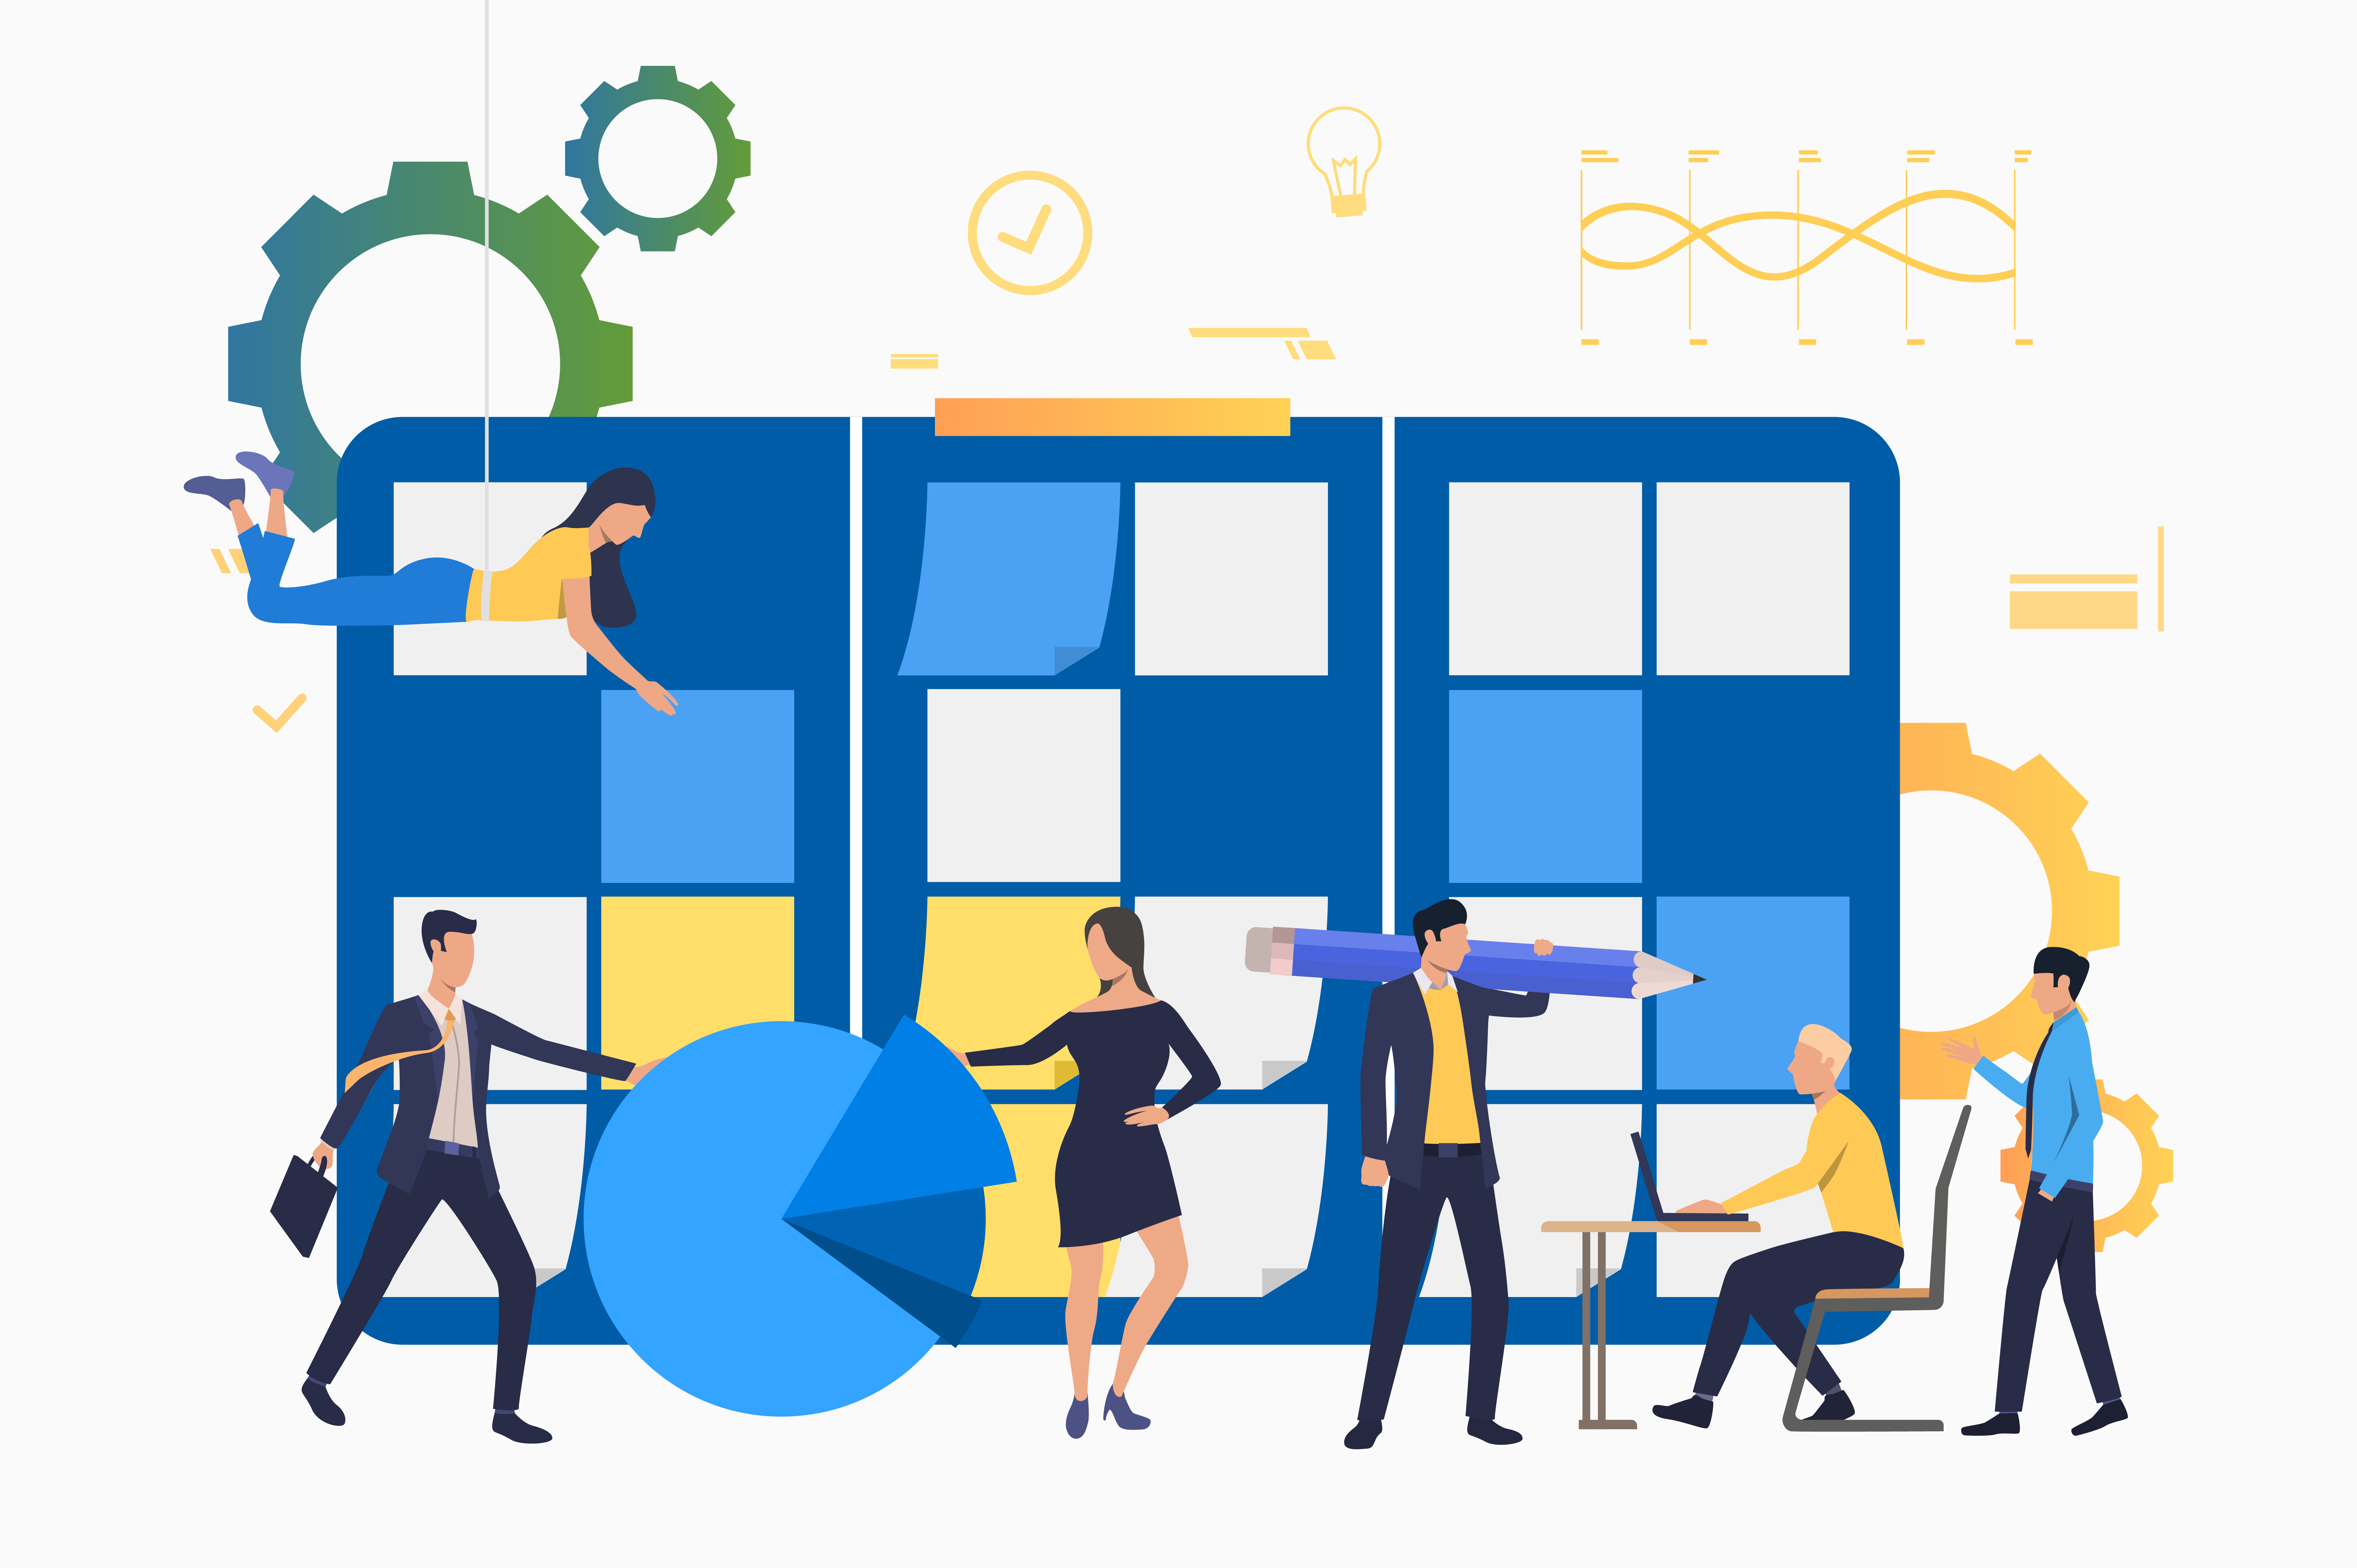 Agile methodology: embracing the change of the new era